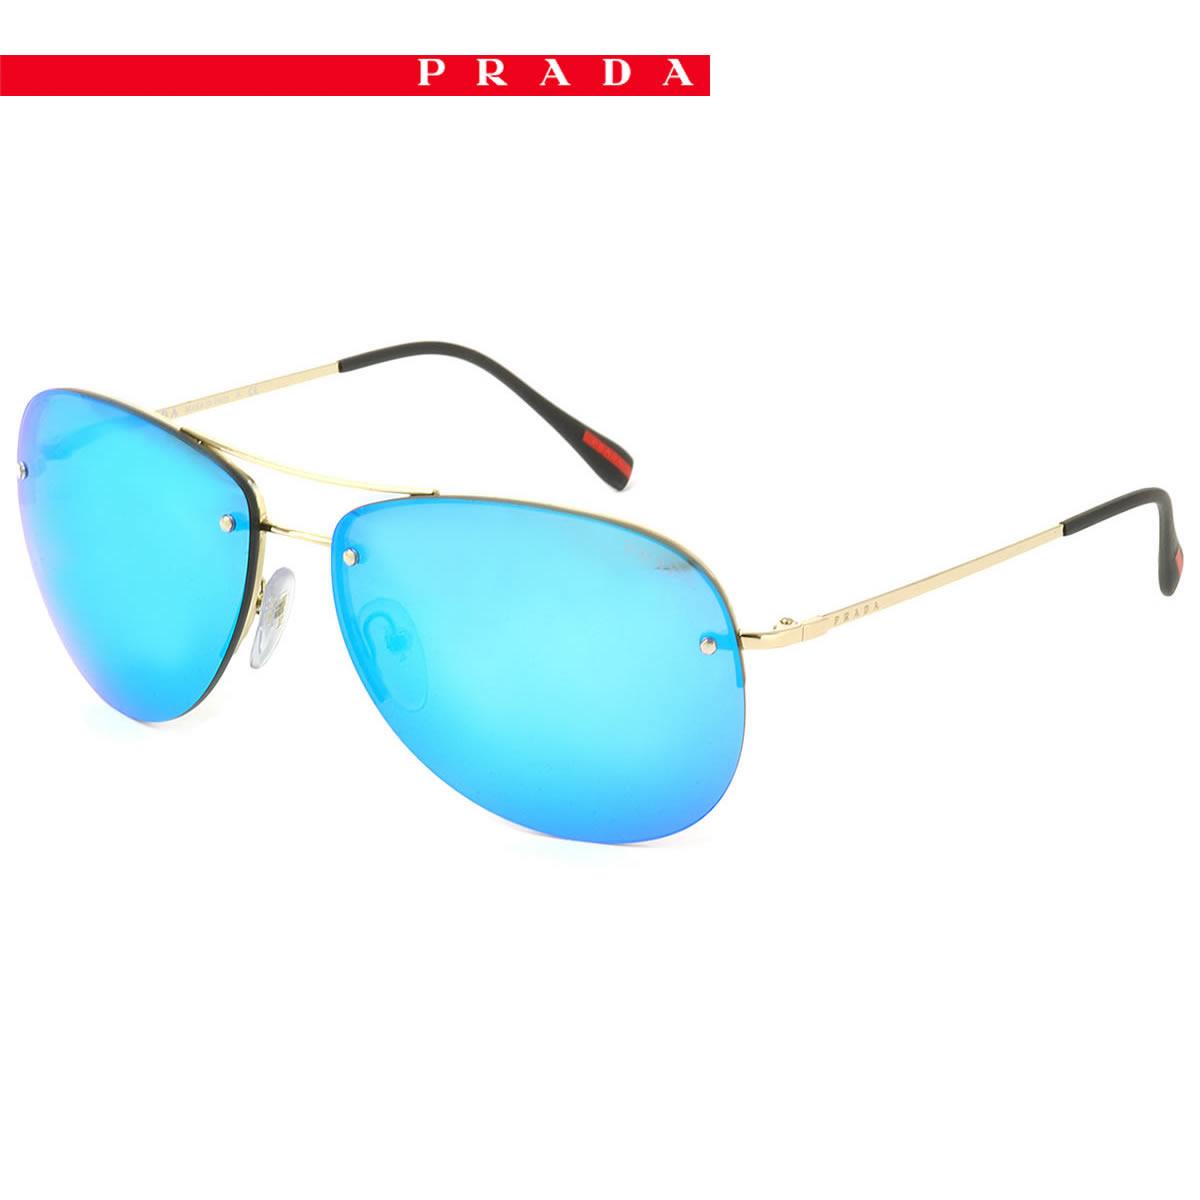 1381c3a20a (PRADA SPORT) sunglasses PS50RS ZVN5M2 62 size teardrop mirror lens PRADA  SPORTS リネアロッサ LINEA ROSSA PRADASPORT men gap Dis